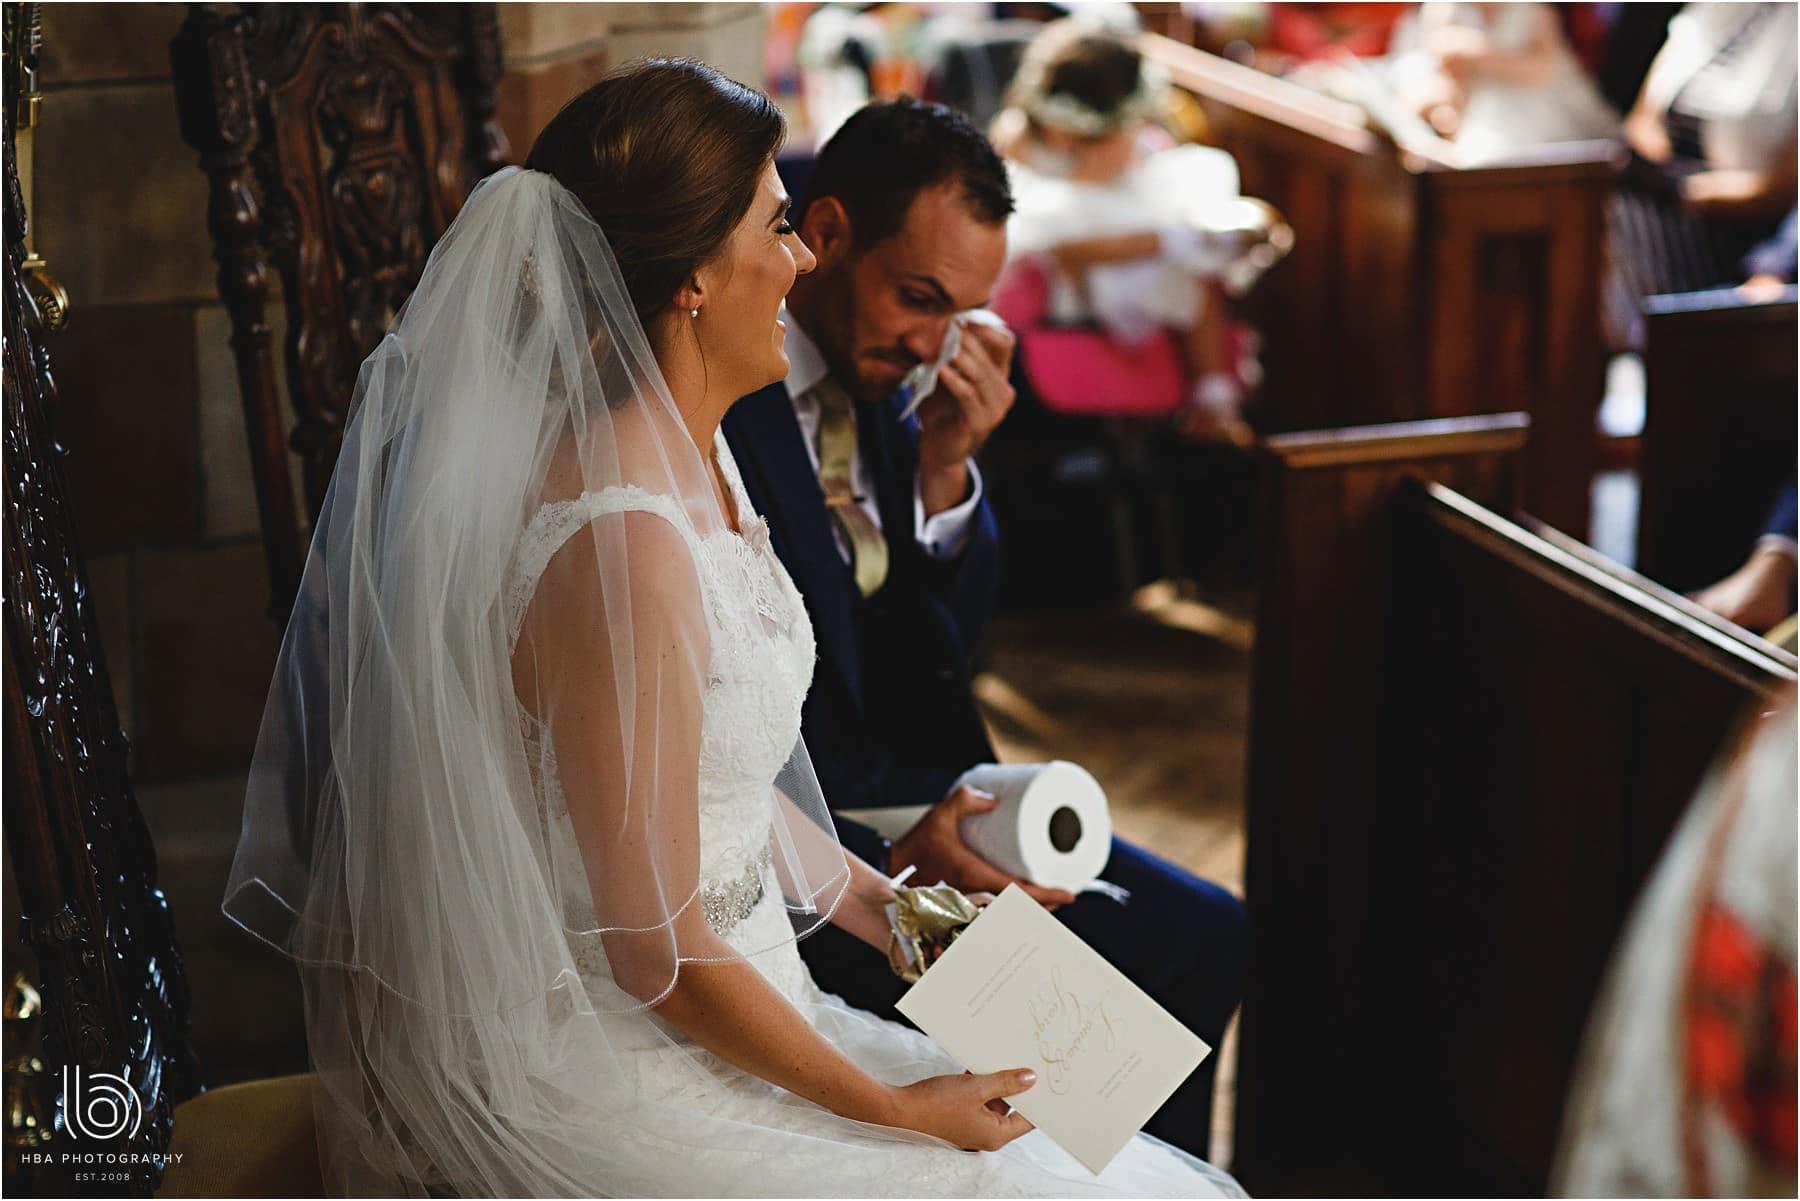 the groom hvaing a few tears